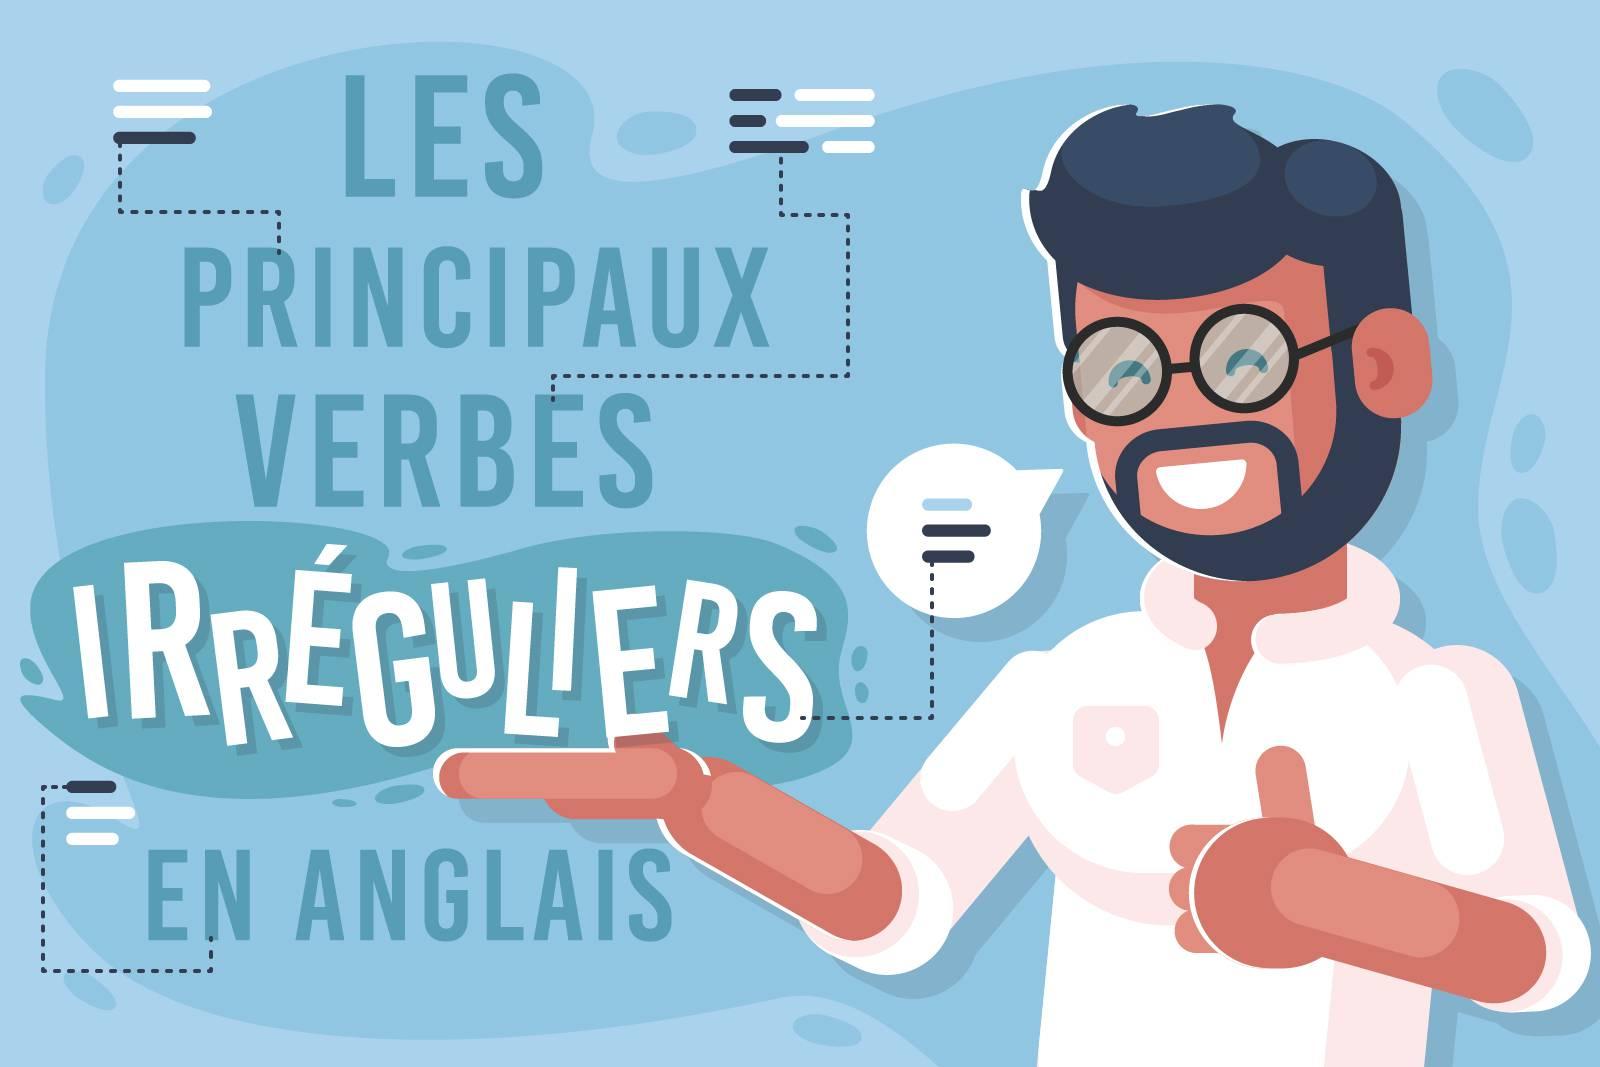 Principaux verbes irréguliers anglais